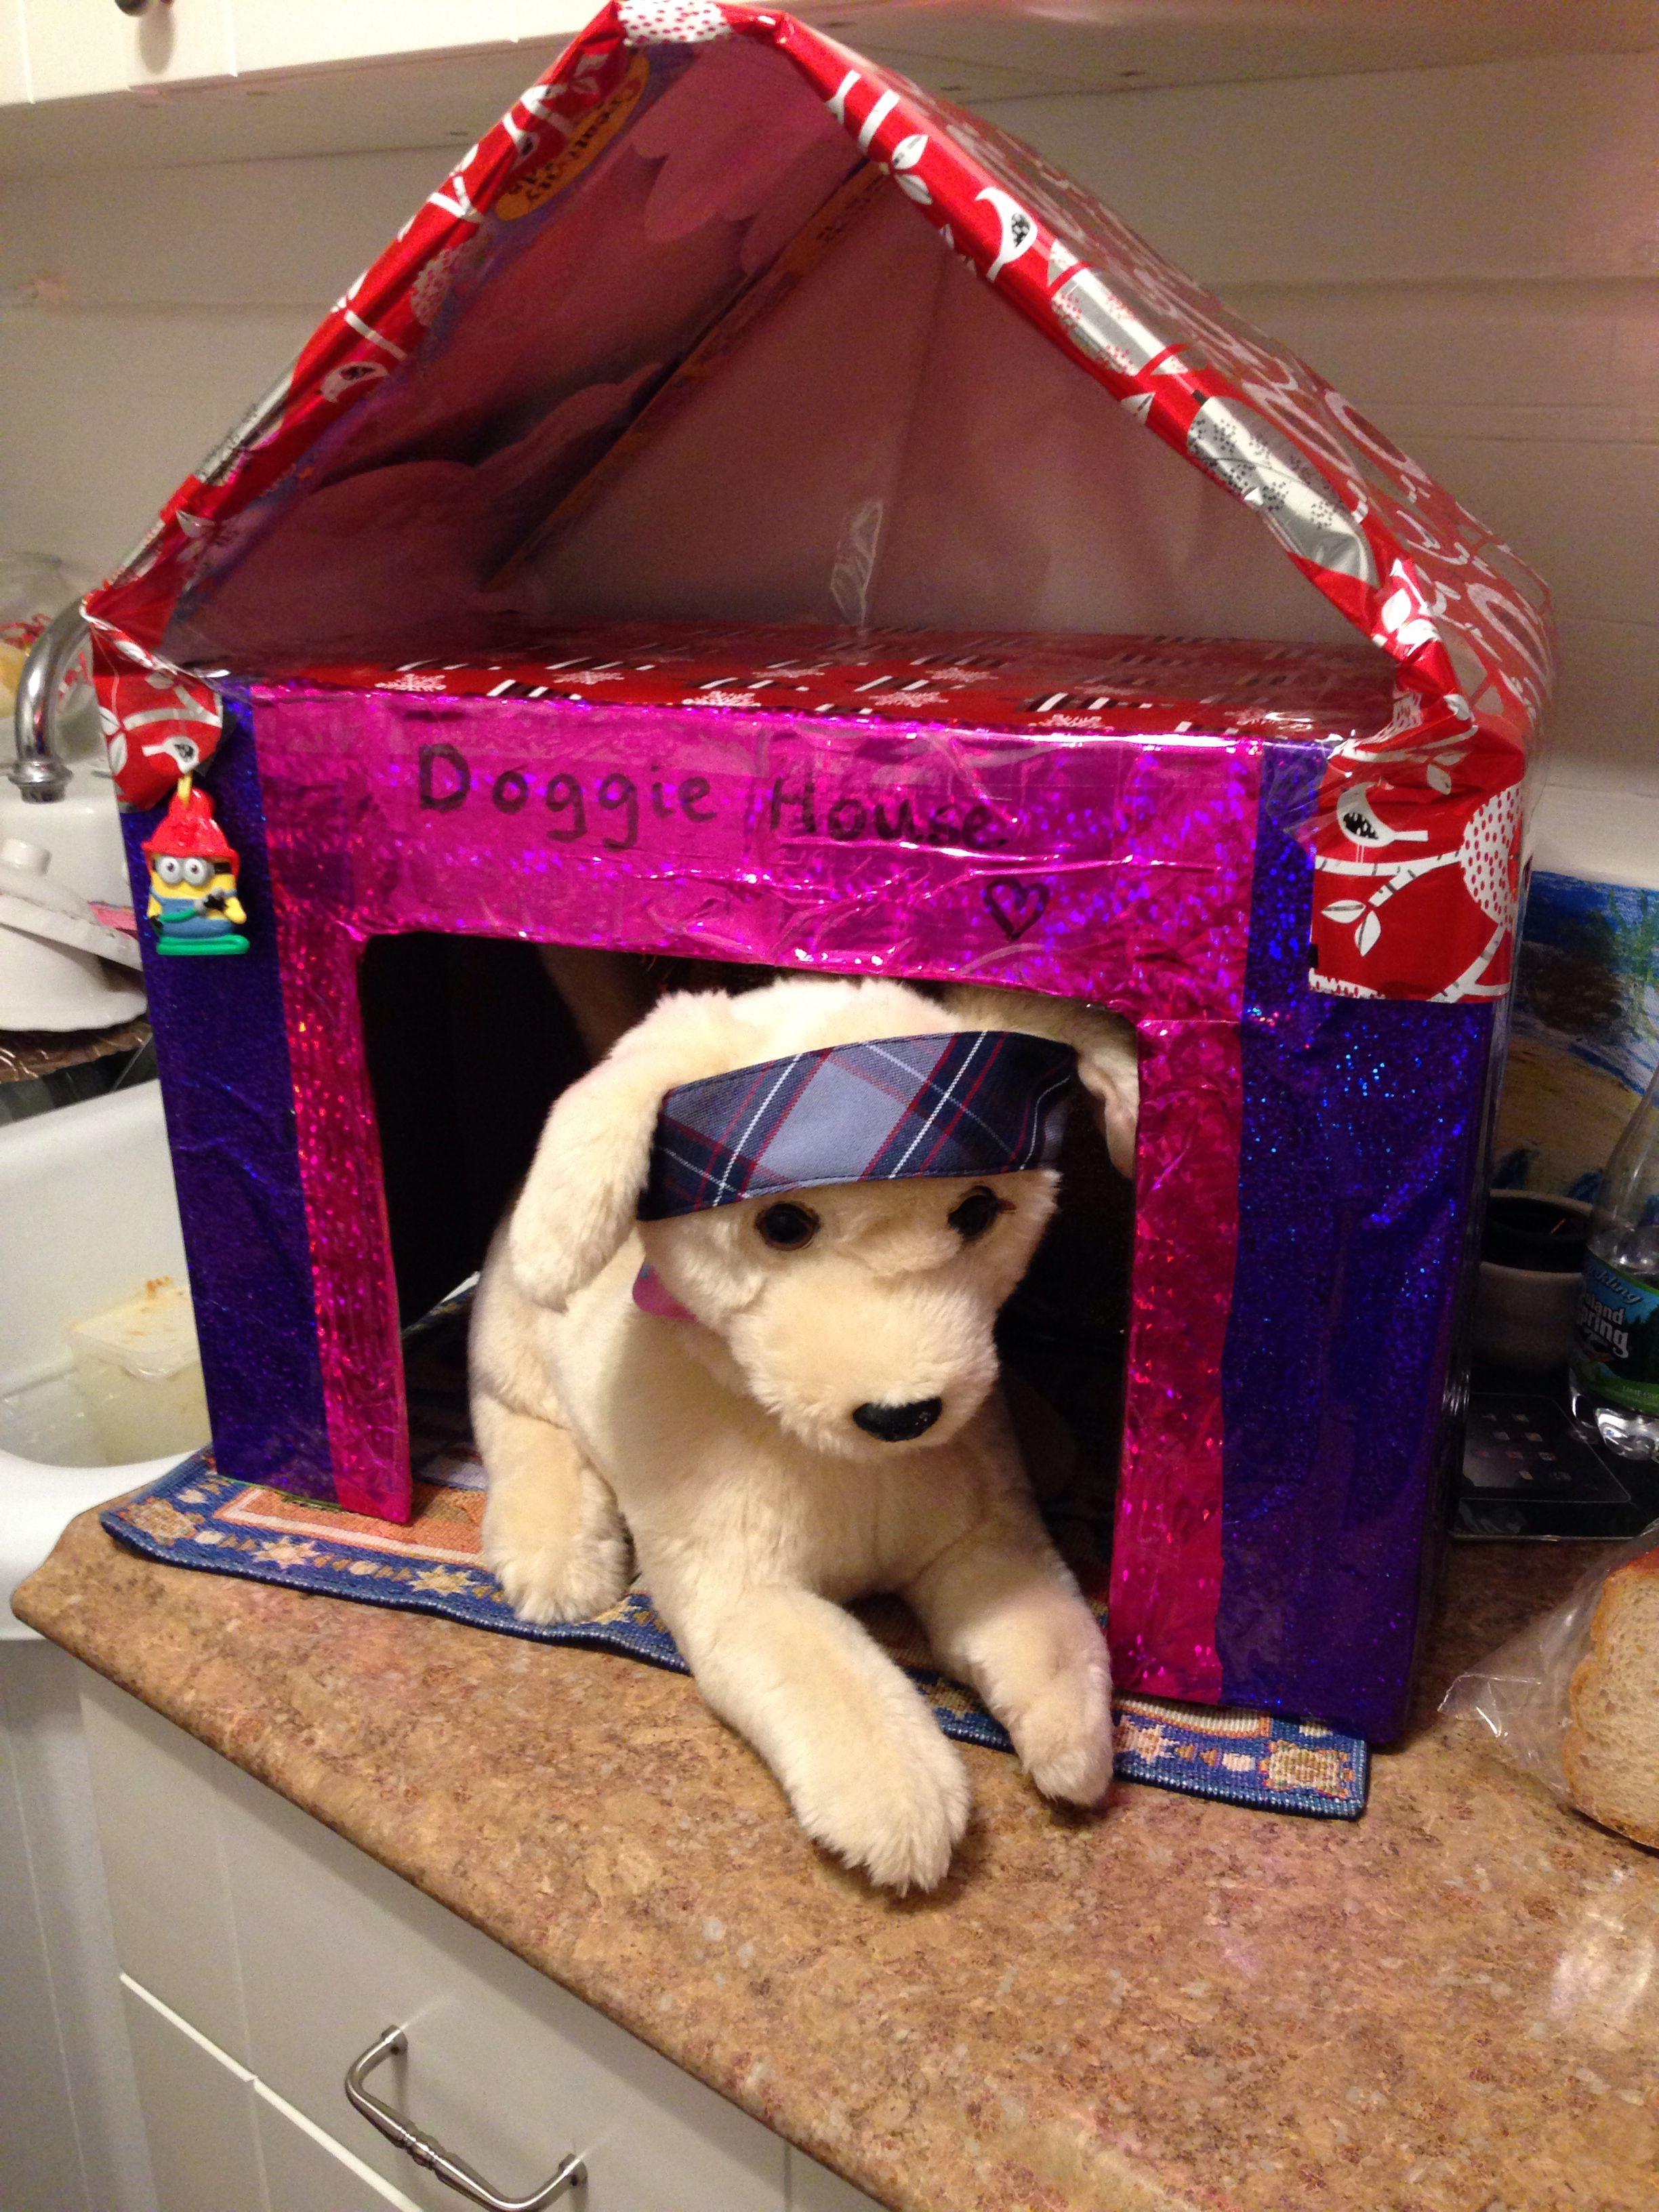 Wood Tools For Sale Dog House Diy Diy Dog Stuff Cat House Diy [ 3264 x 2448 Pixel ]